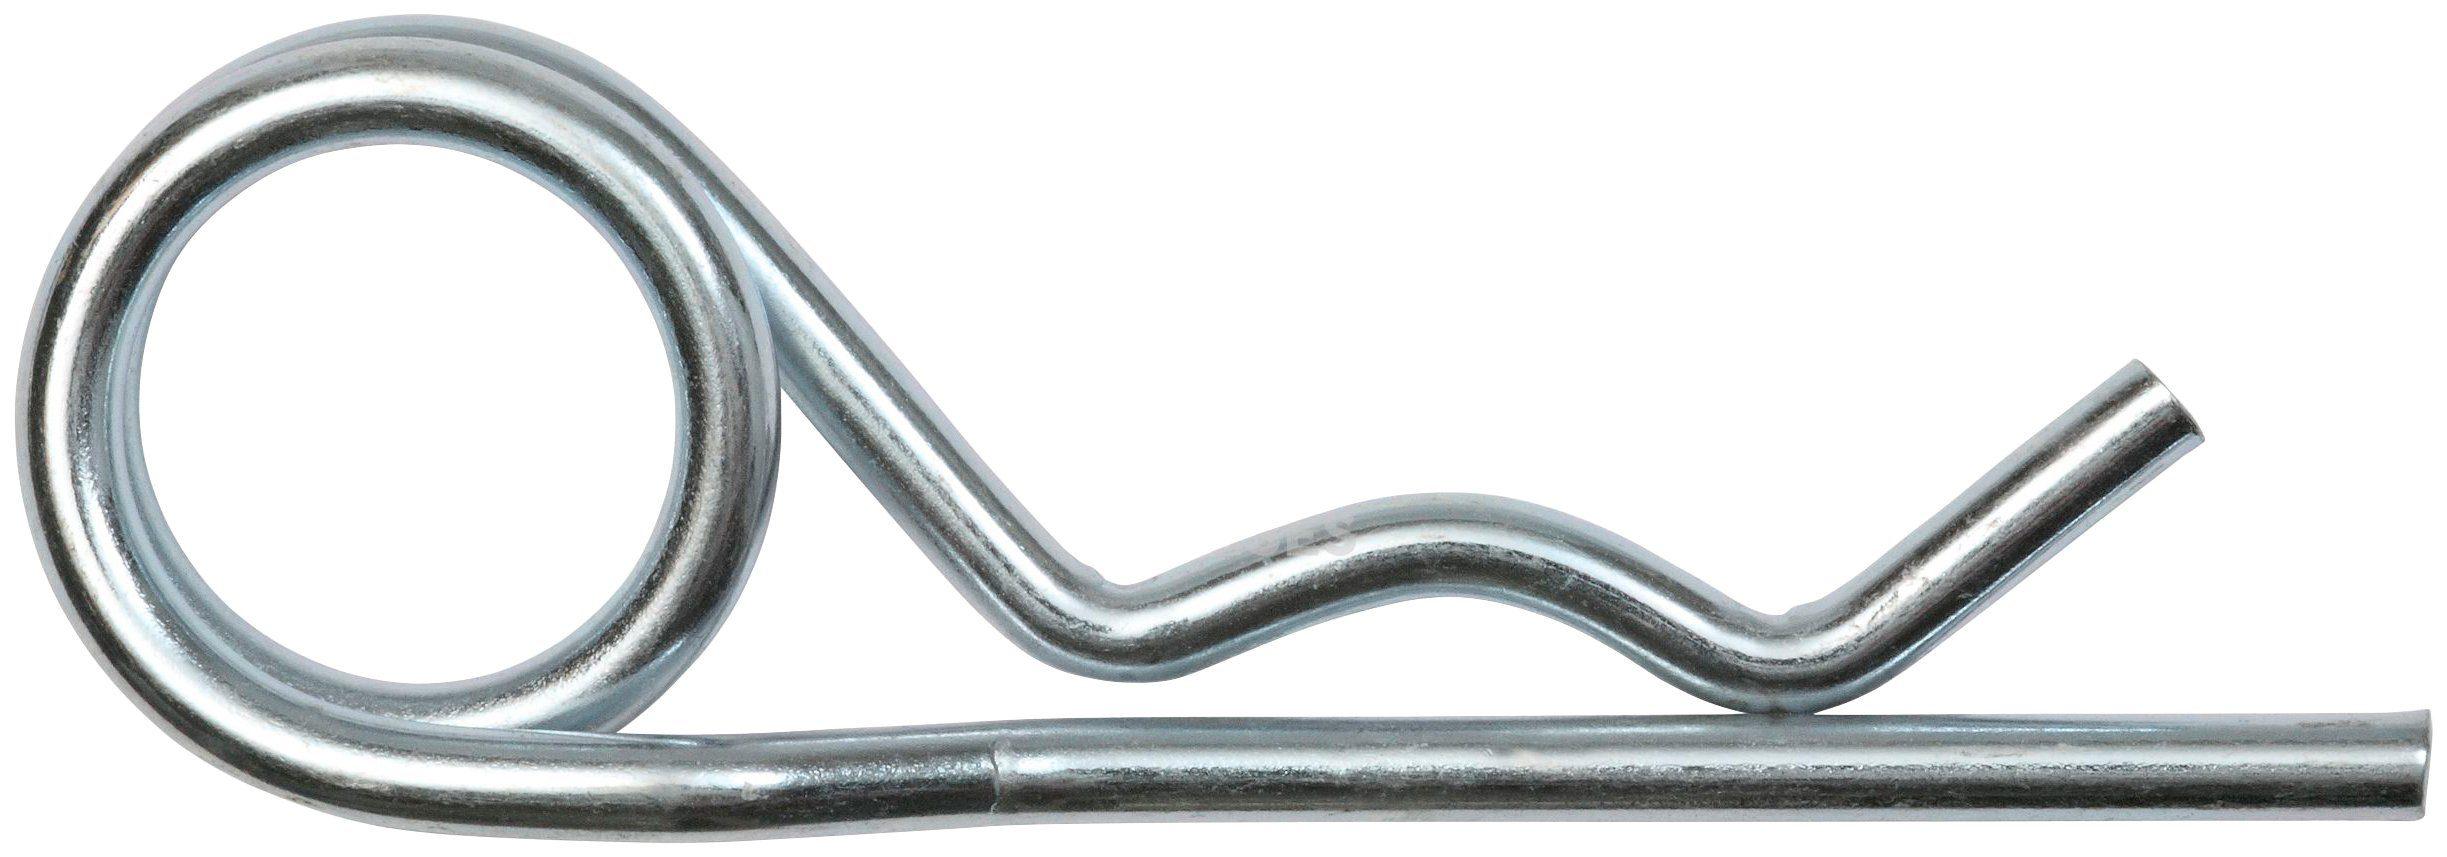 RAMSES Federstecker , doppelt 5,5 mm Stahl verzinkt 50 Stück